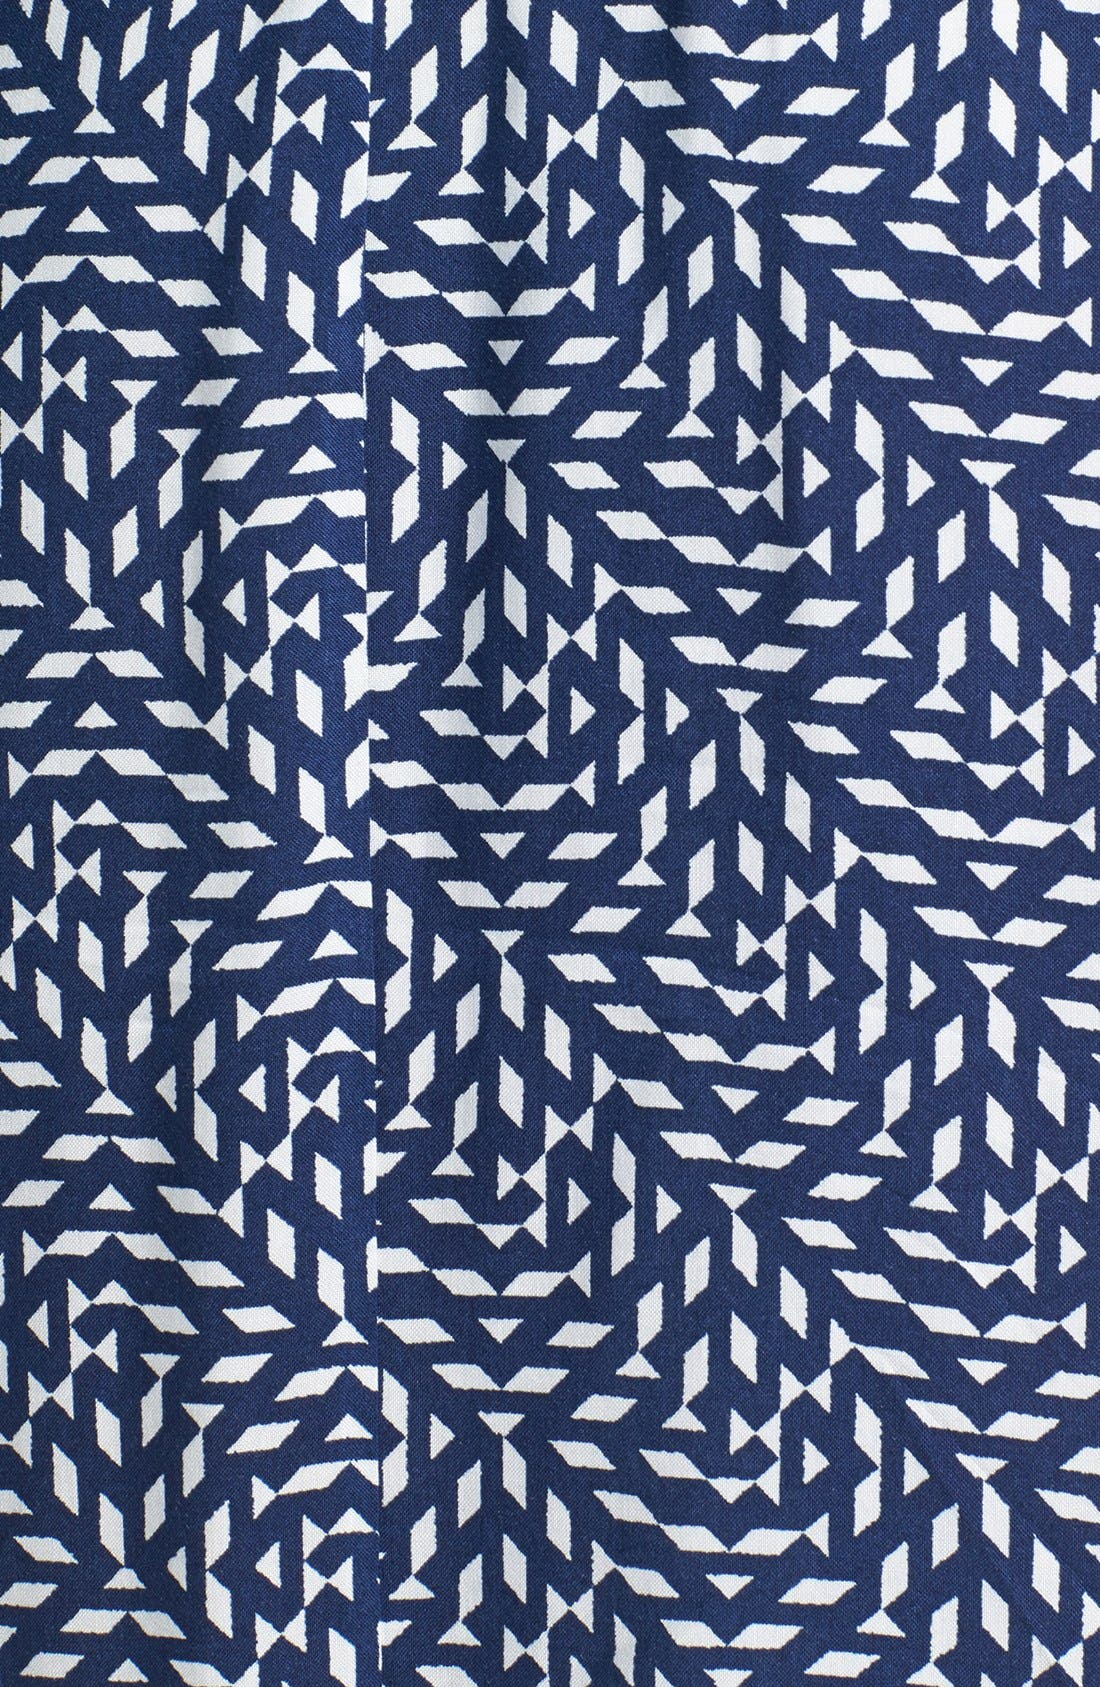 Alternate Image 3  - dee elle Embroidered Print Maxi Dress (Juniors)